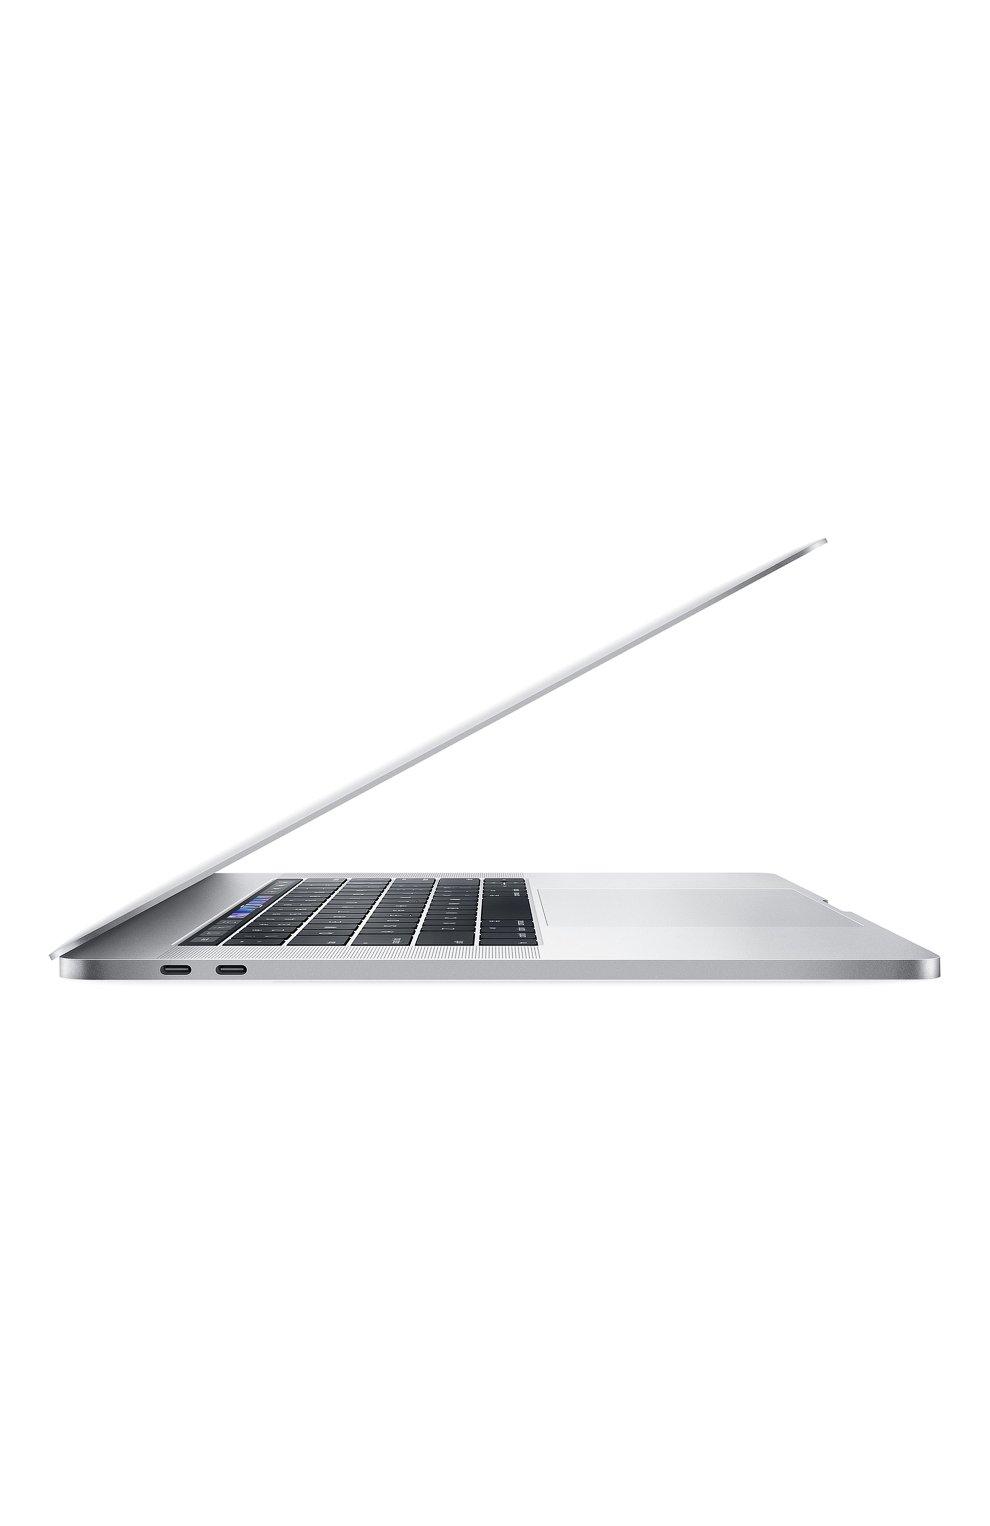 "MacBook Pro 15"" с панелью Touch Bar со встроенным датчиком Touch ID 6-Core i7 2.6GHz 512GB Silver Apple    Фото №2"